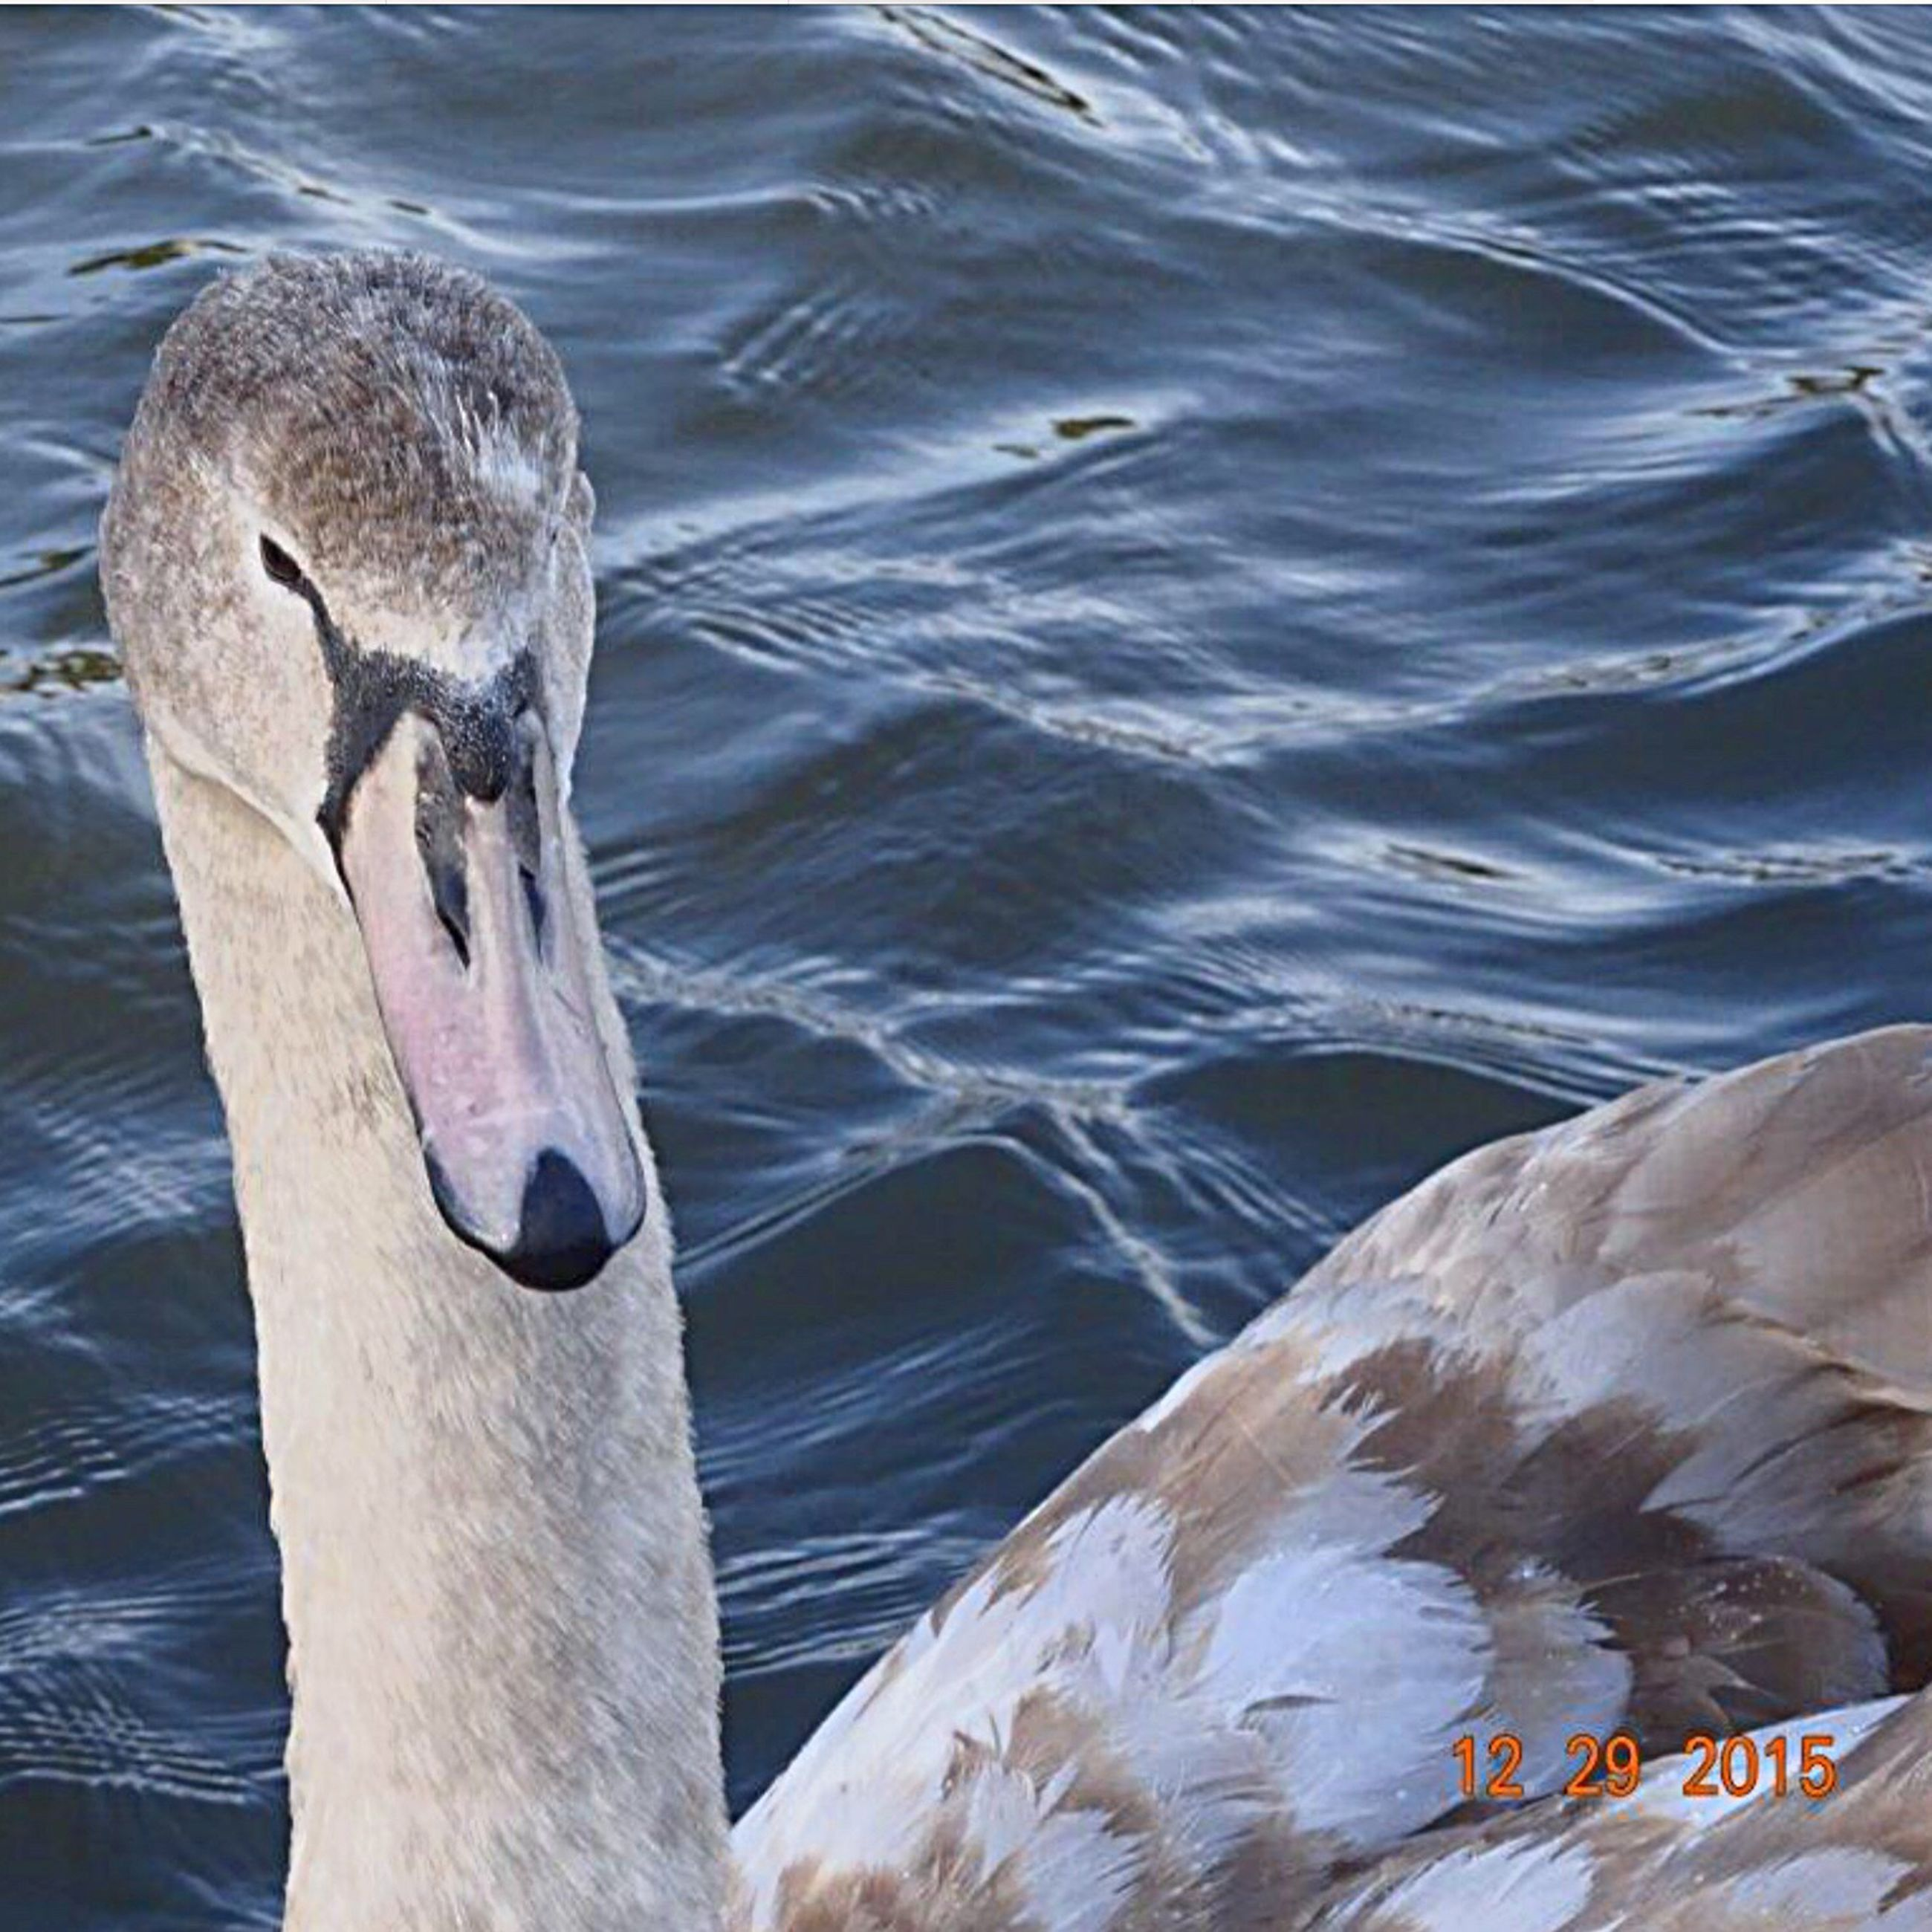 water, animal themes, bird, wildlife, animals in the wild, rippled, lake, swimming, swan, beak, one animal, high angle view, nature, waterfront, duck, outdoors, day, water bird, no people